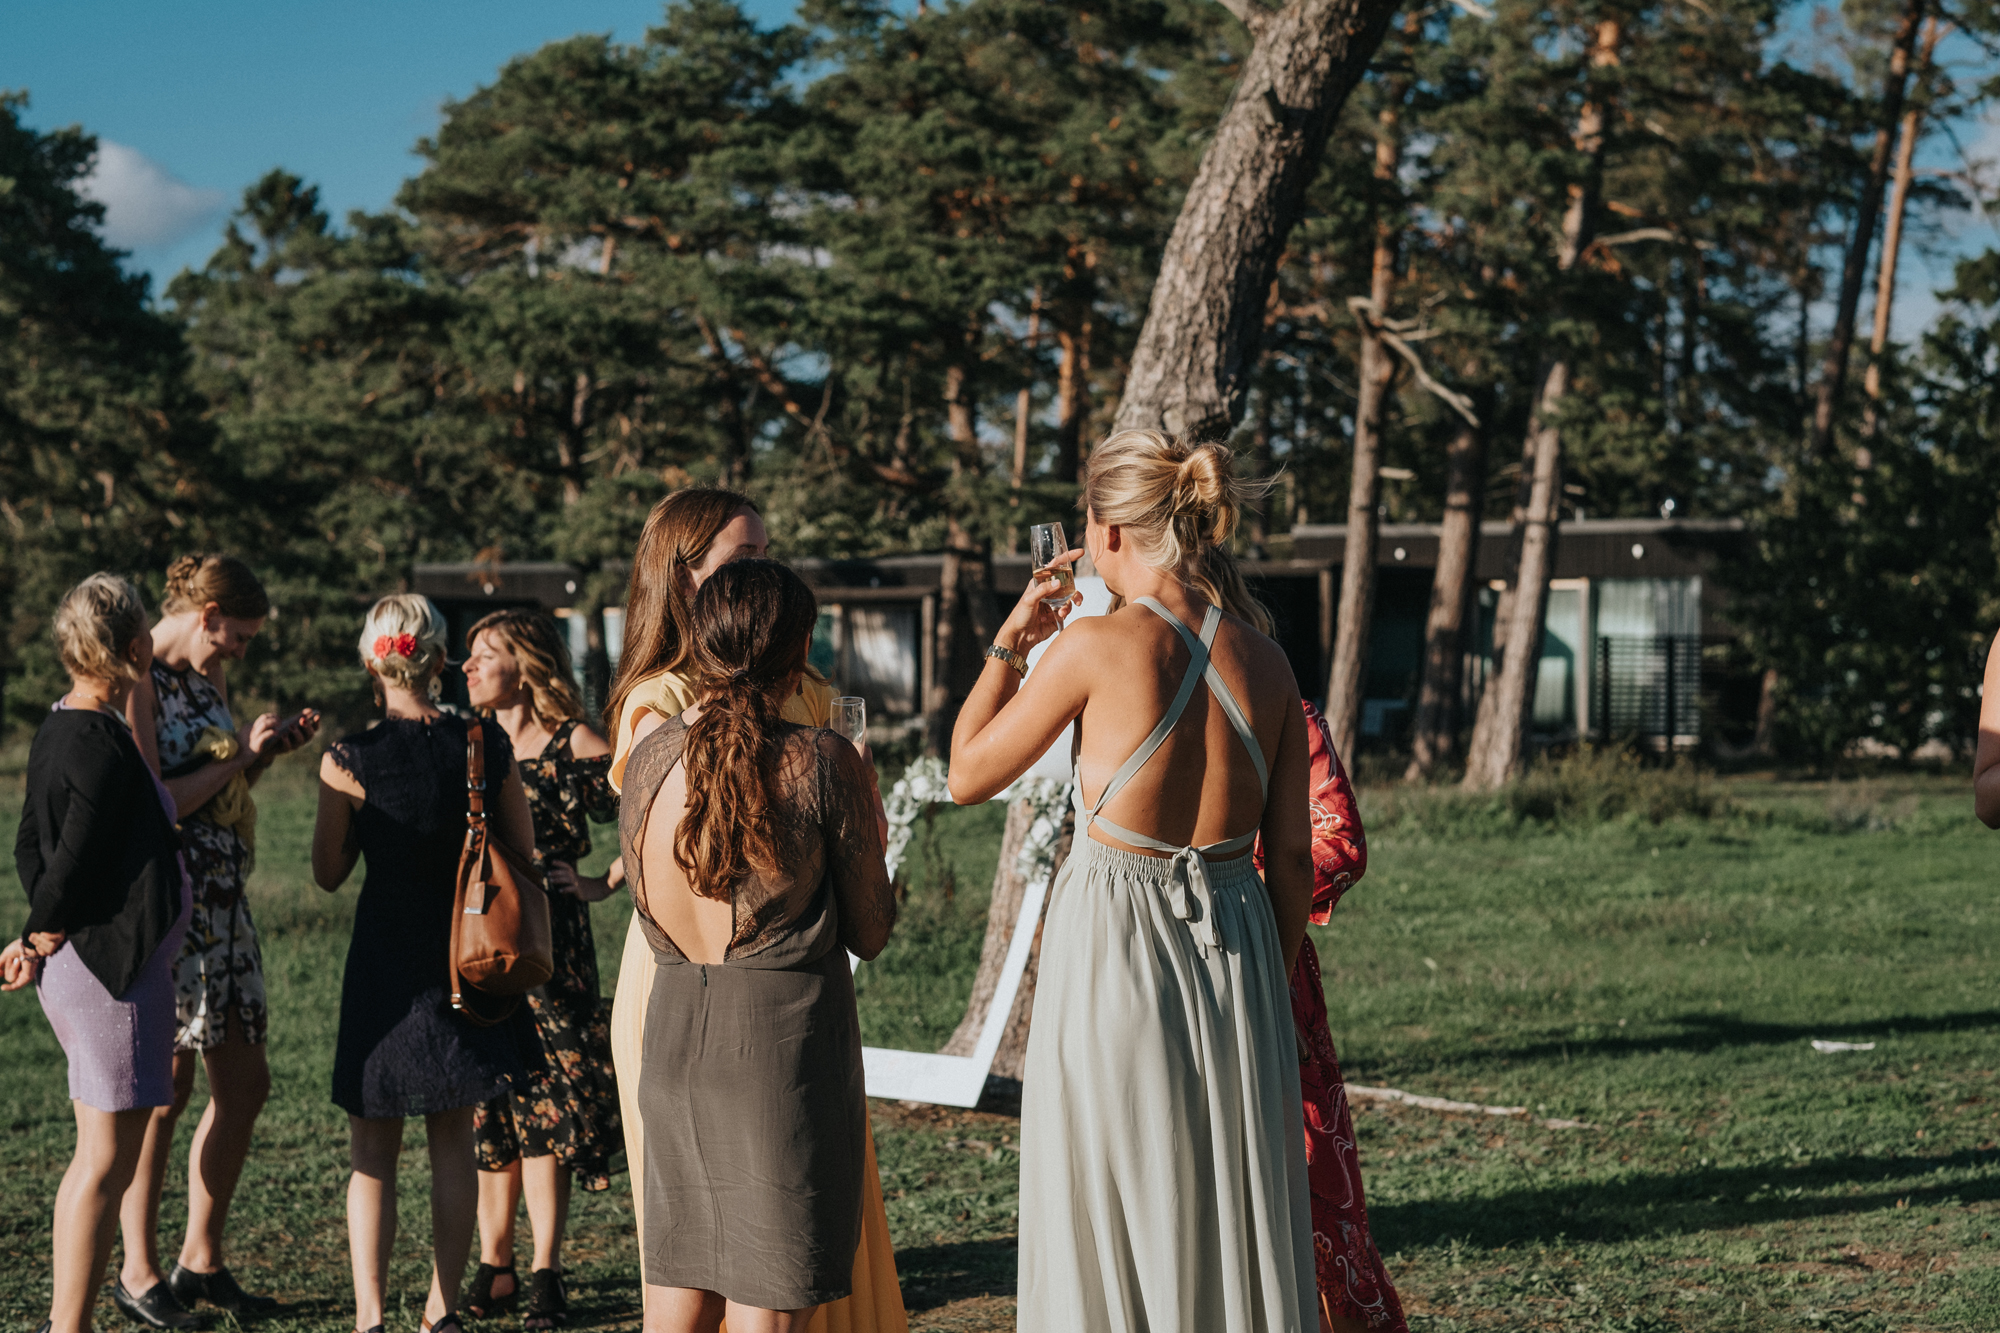 055-bröllop-djupvik-hotel-neas-fotografi.jpg